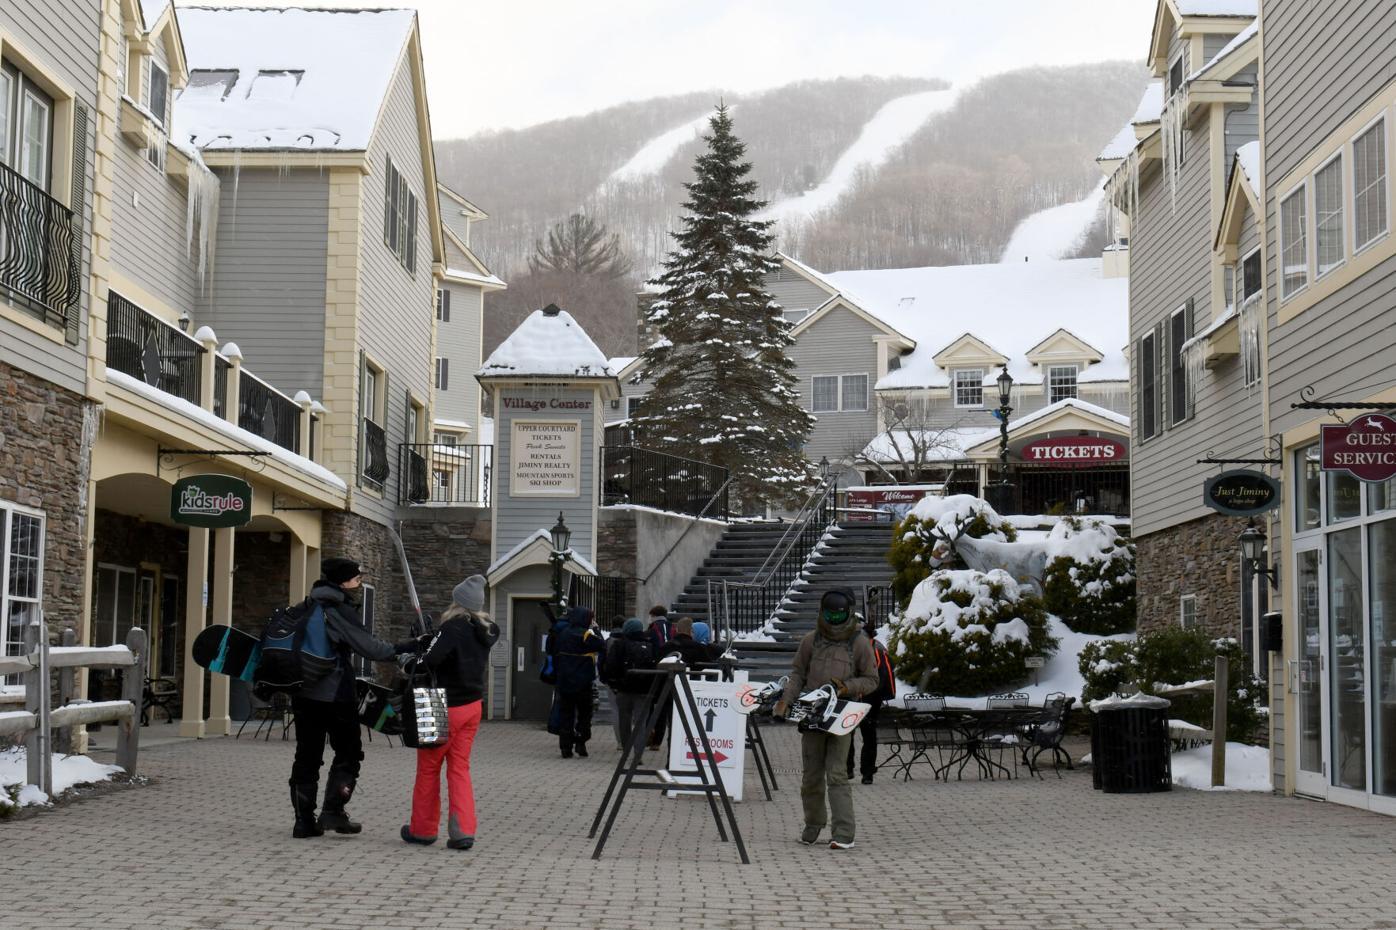 Congressman Richard E. Neal tours Jiminy Peak Mountain Resort to tout Renewable Energy Investments